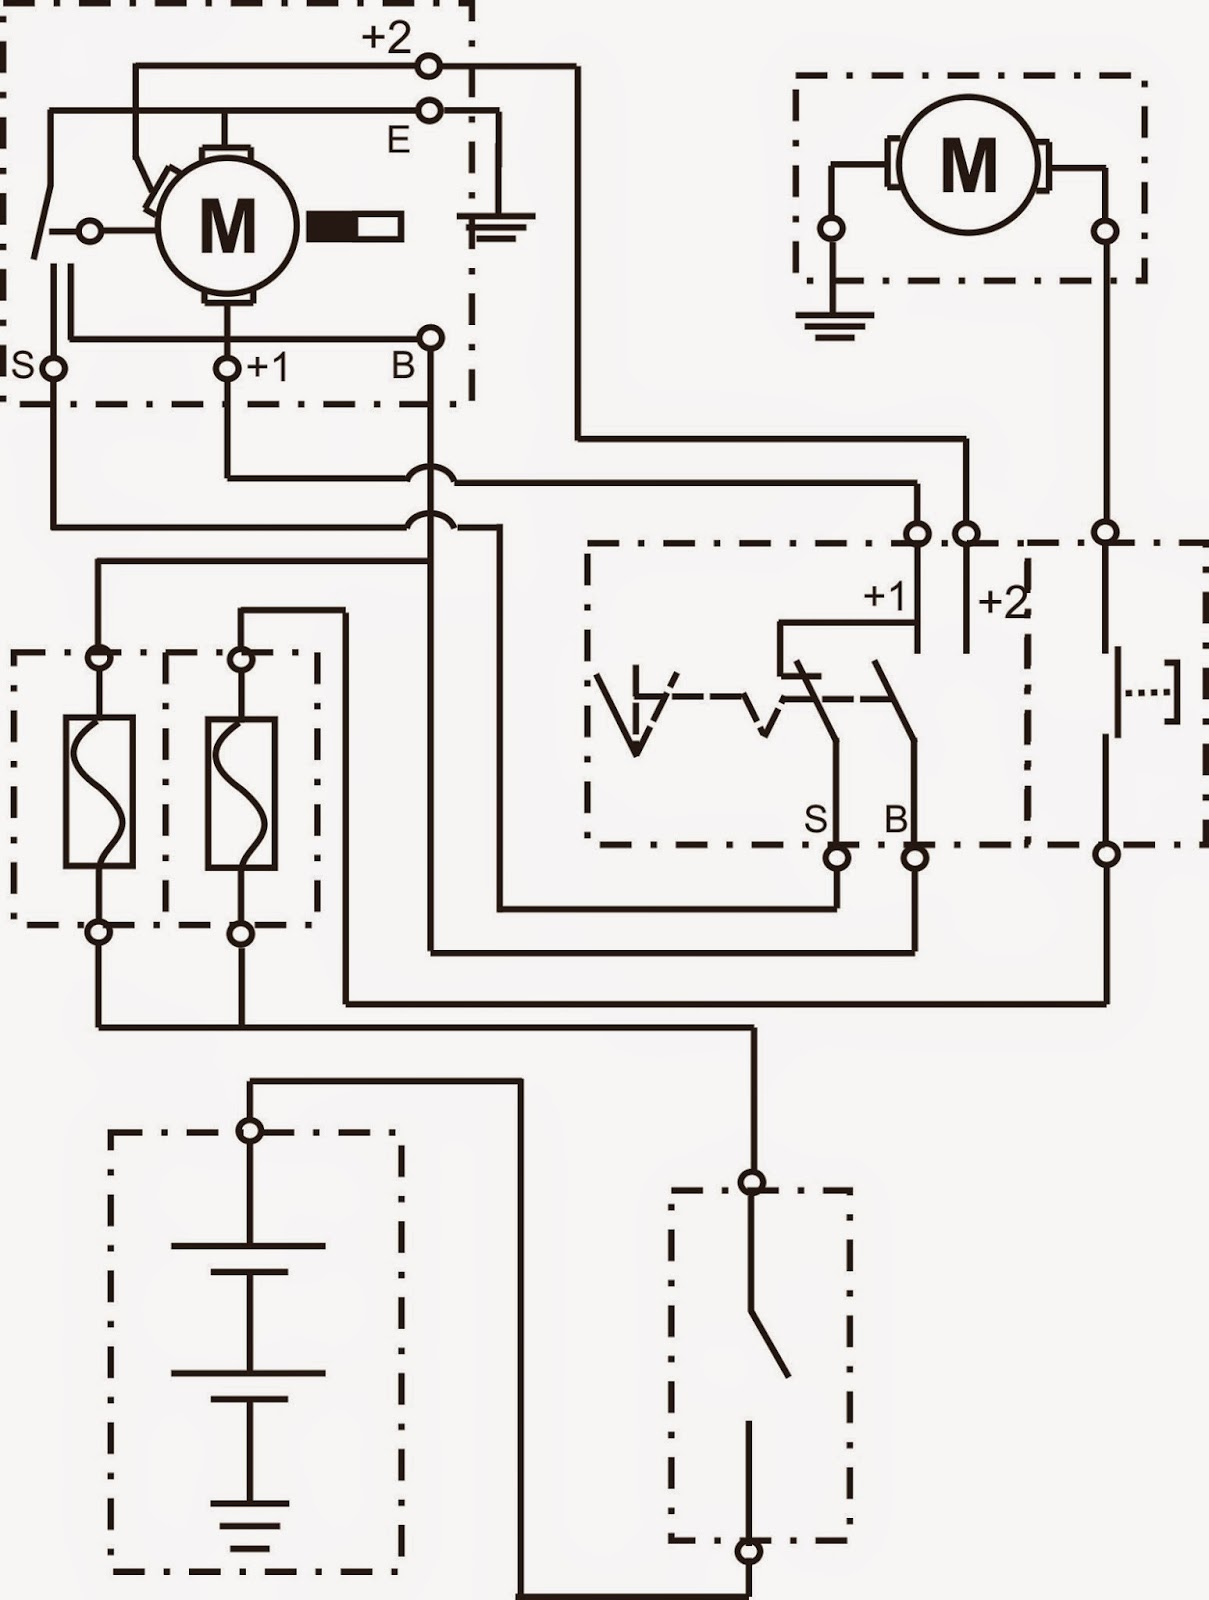 Materi Sistem Kelistrikan Otomotif | OTOMOTIF ZONE